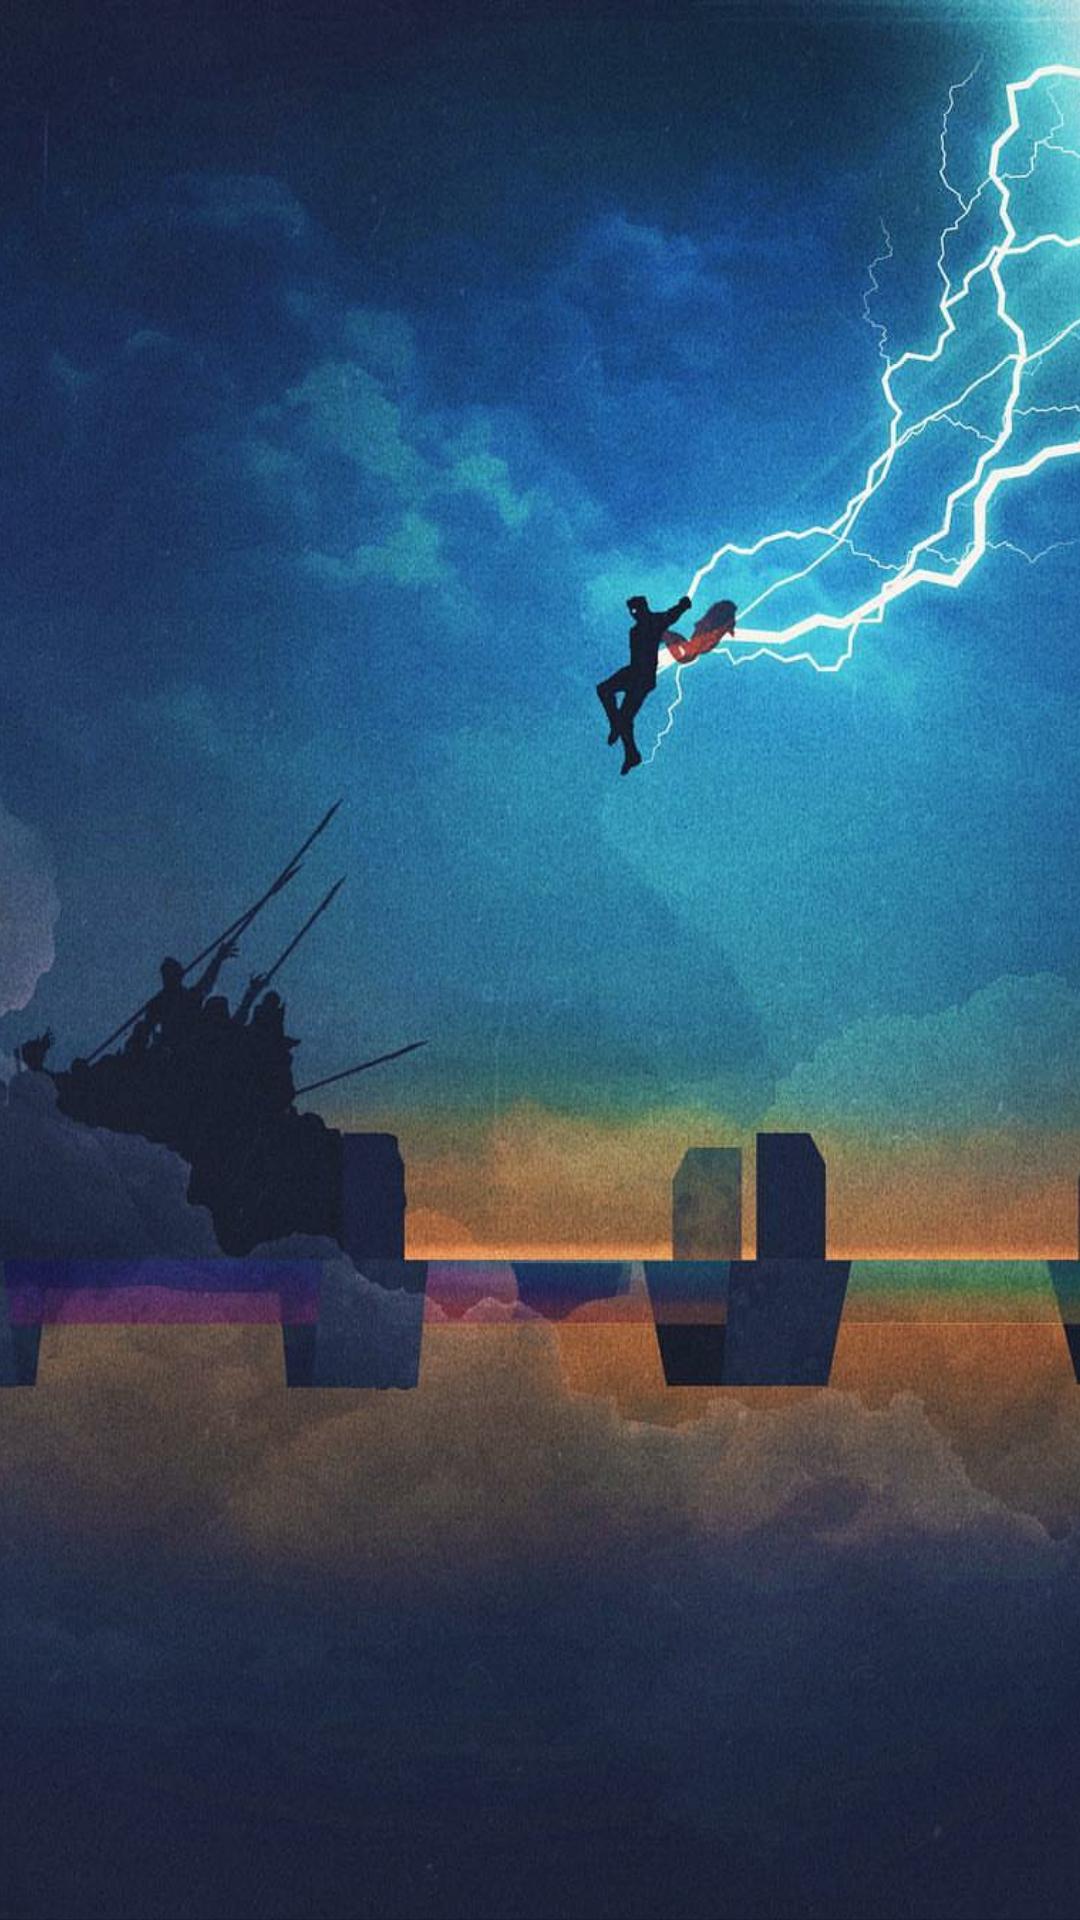 Thor stormbreaker attack iphone wallpaper - Thor art wallpaper ...